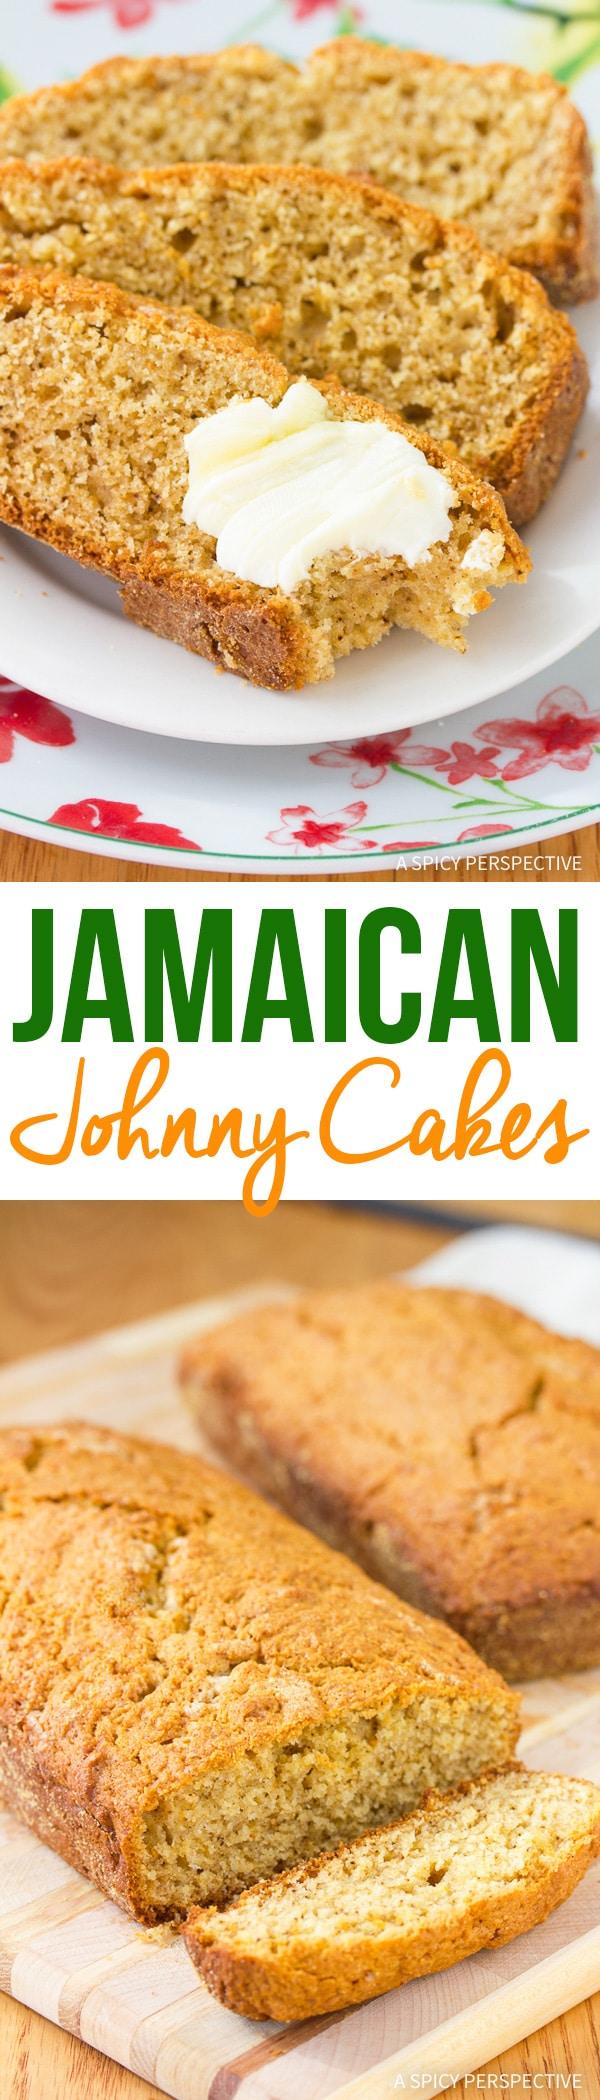 Tender Jamaican Johnny Cakes Recipe